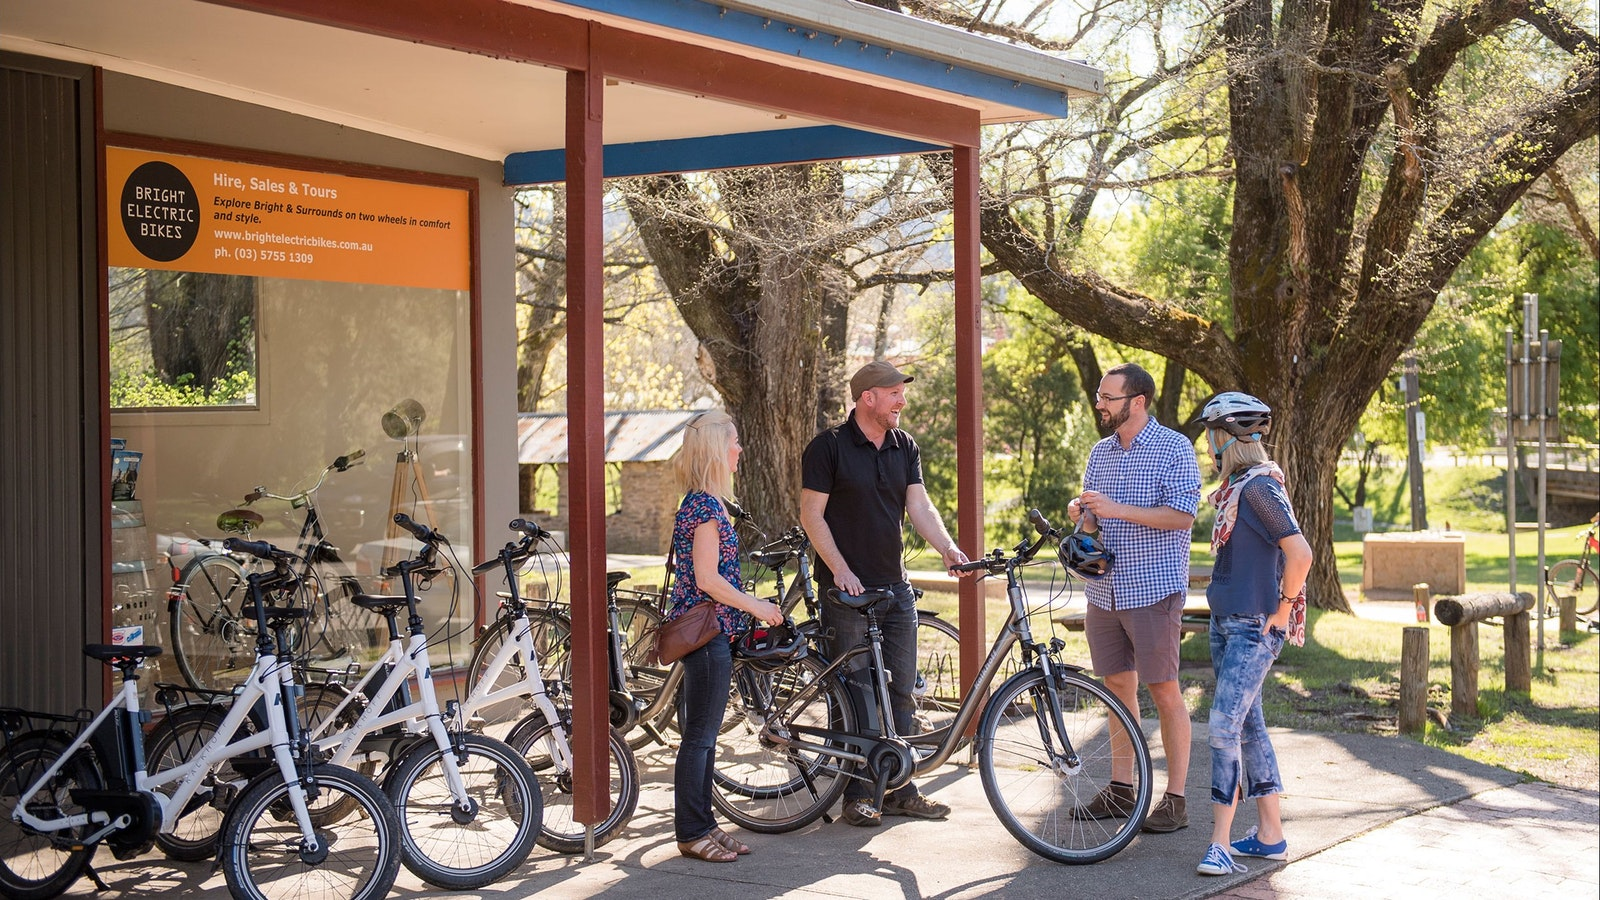 Bright Electric Bikes - Hire a bike